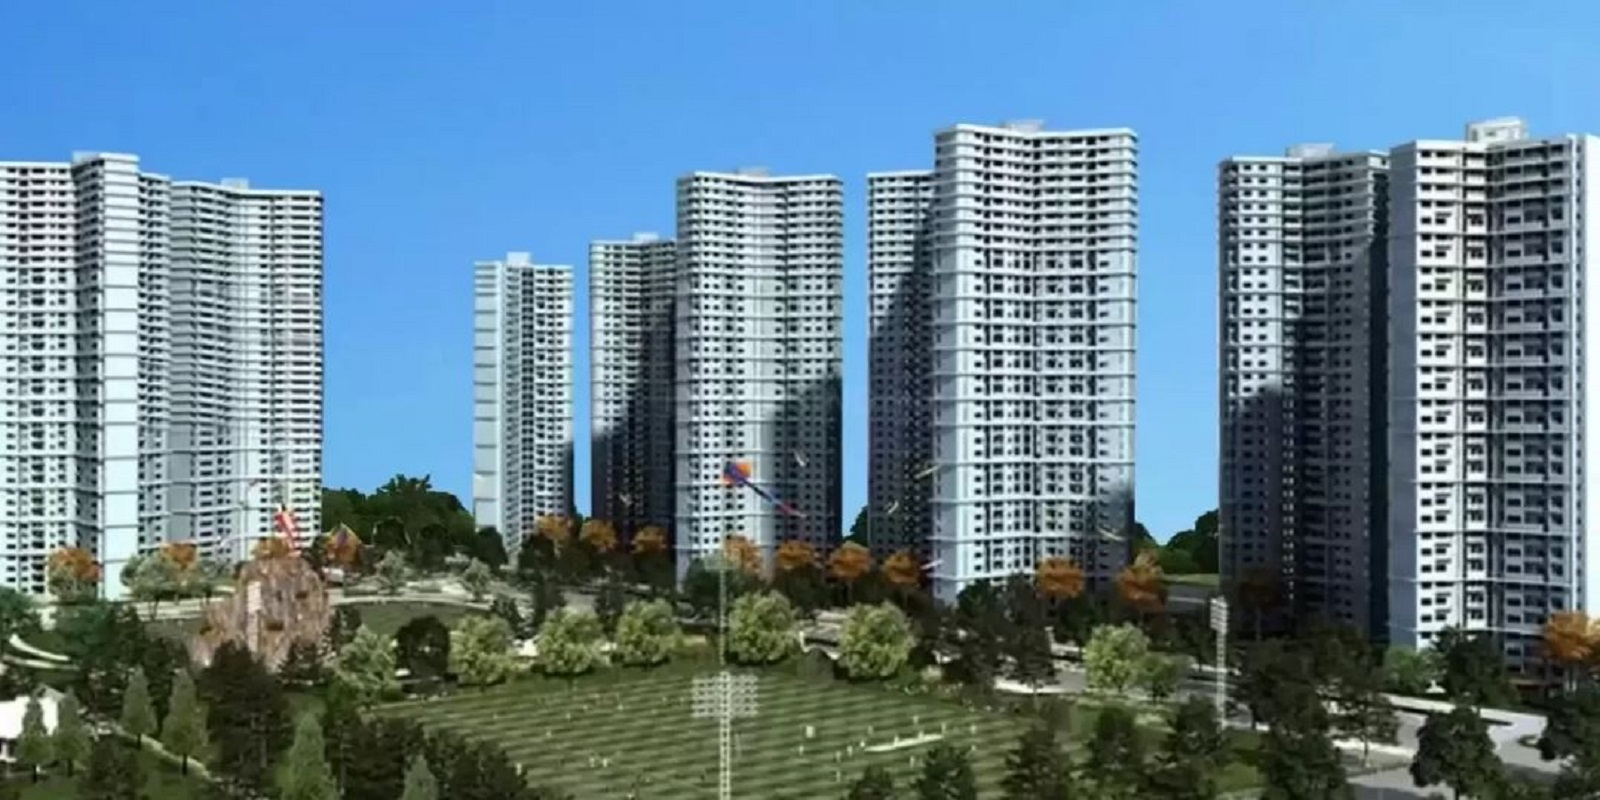 ajnara sports city project large image3